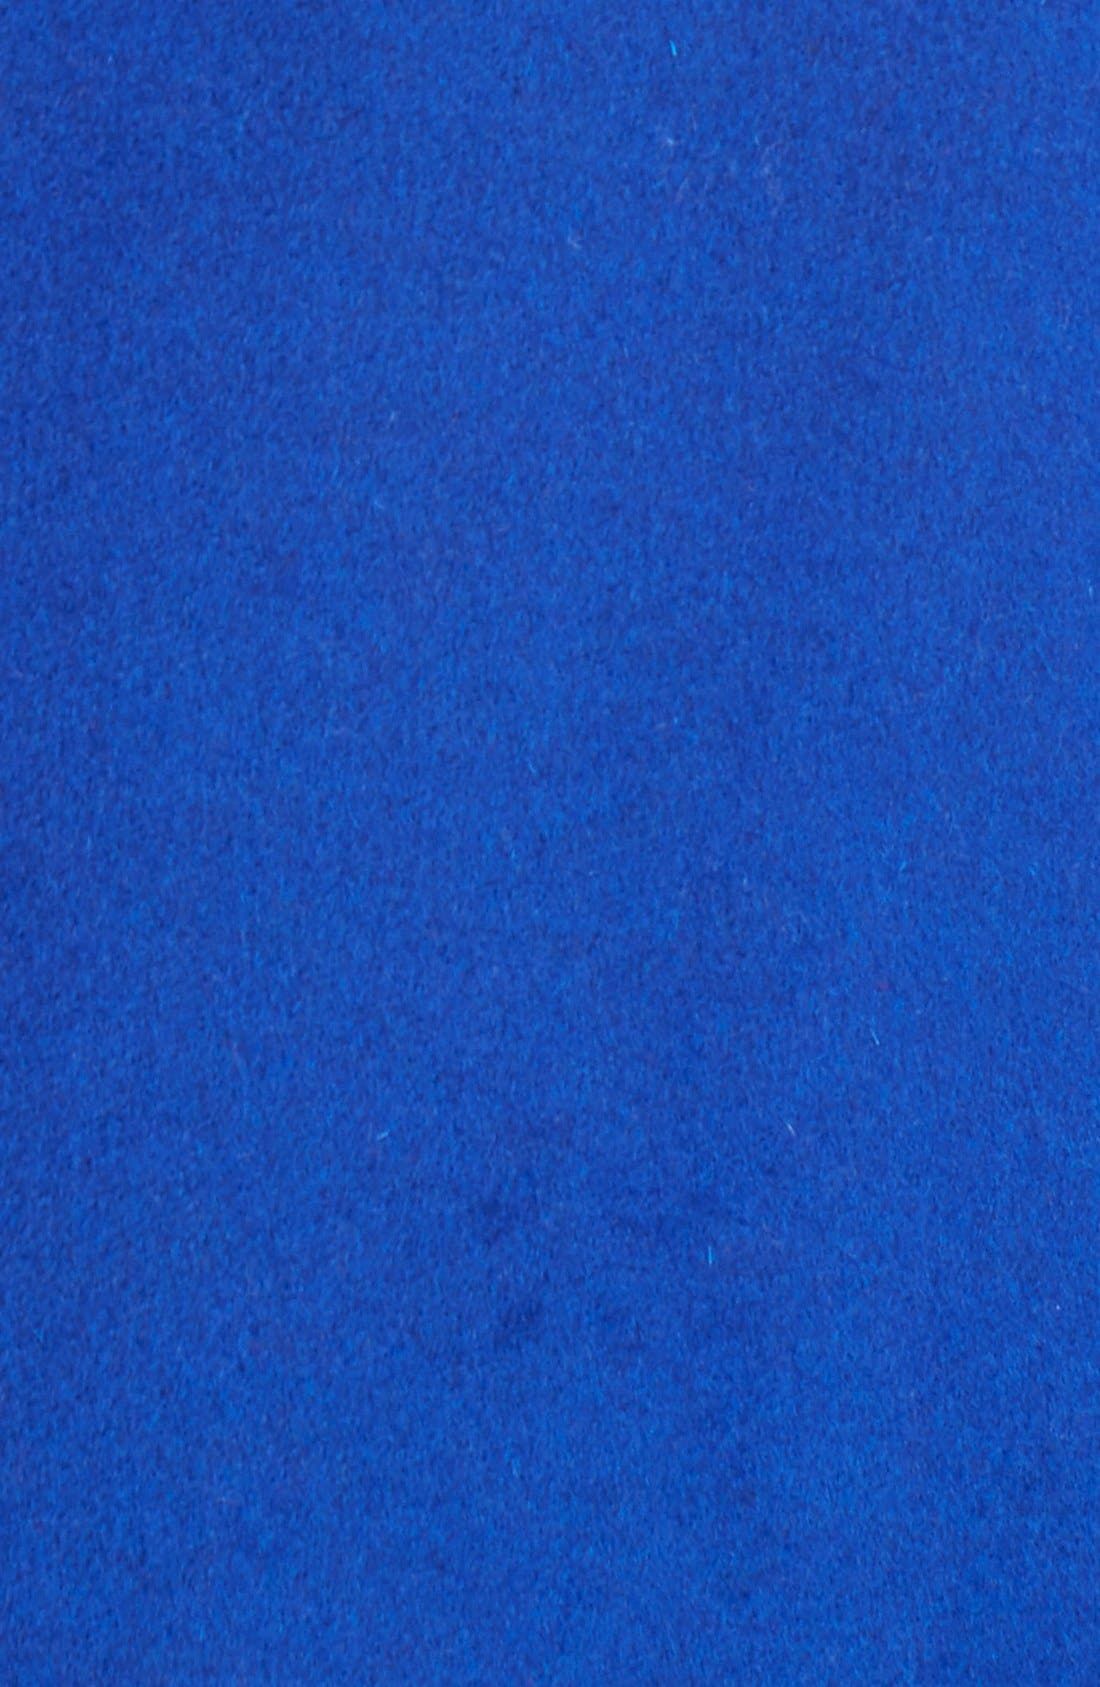 Notch Collar Wool Blend Coat,                             Alternate thumbnail 3, color,                             COBALT